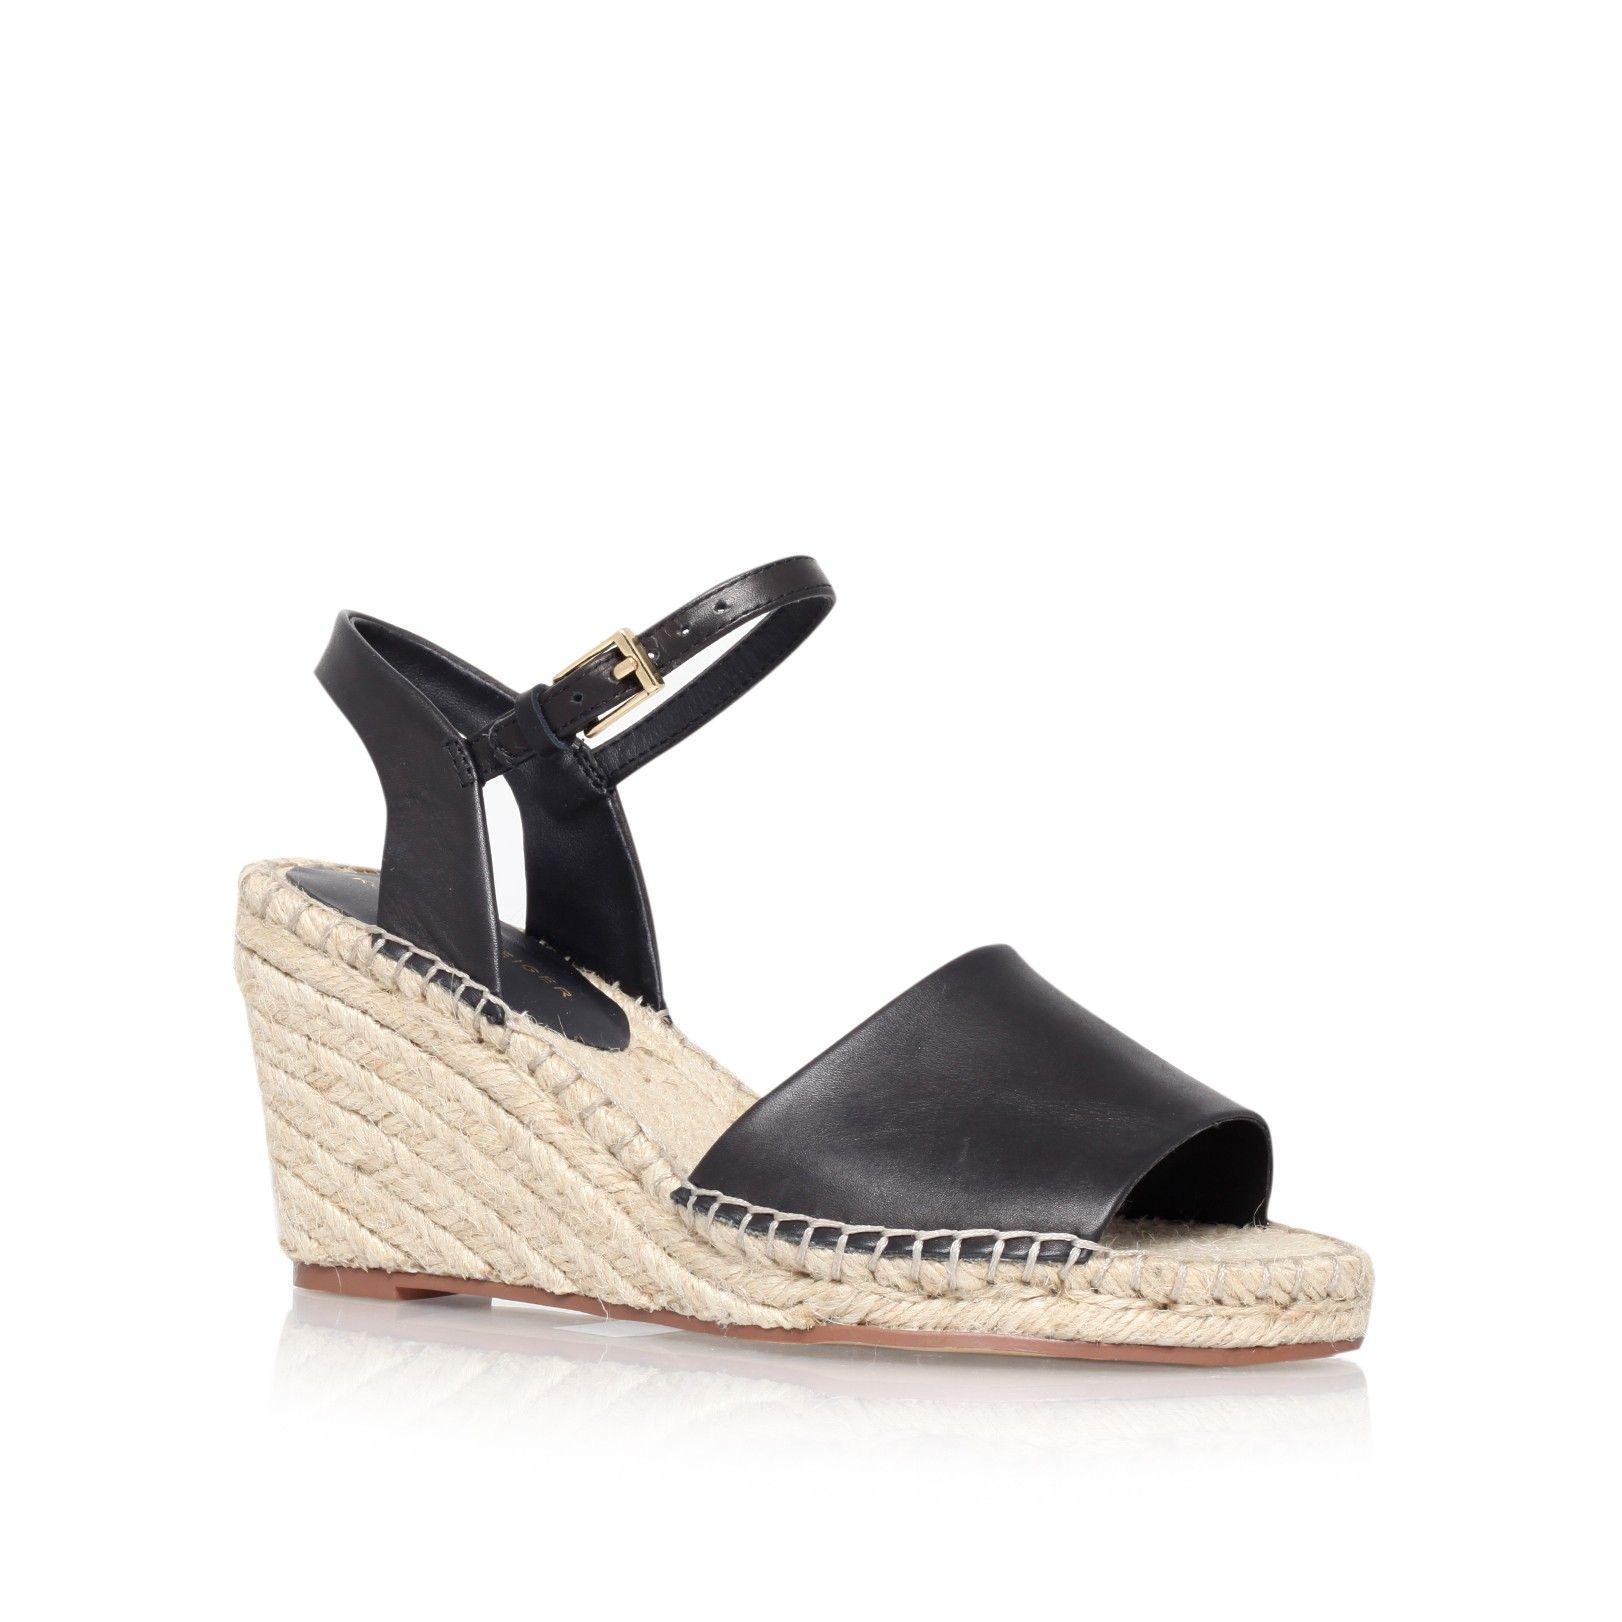 104e443cca2 River Island Womens White stripe Caroline Flack block heel sandal. Caroline  Flack. Faux suede upper. Stripe print. Strappy design. Buckle fast…